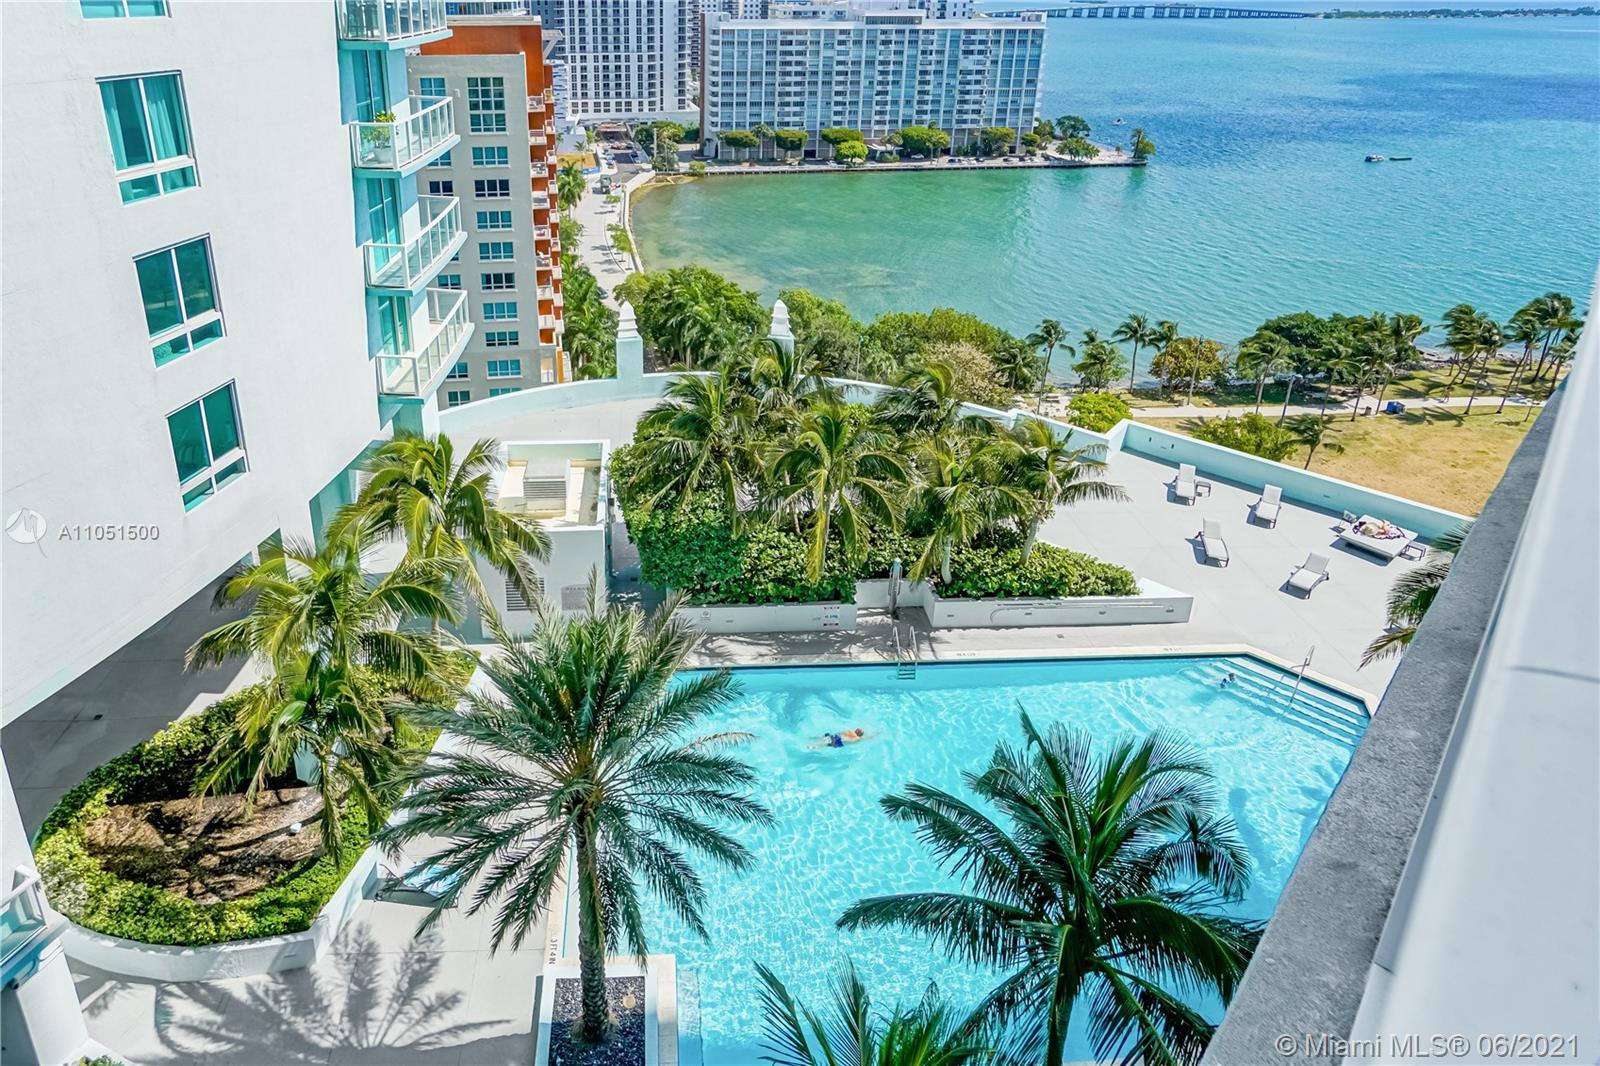 Quantum on the Bay #1710 - 1900 N Bayshore Dr #1710, Miami, FL 33132